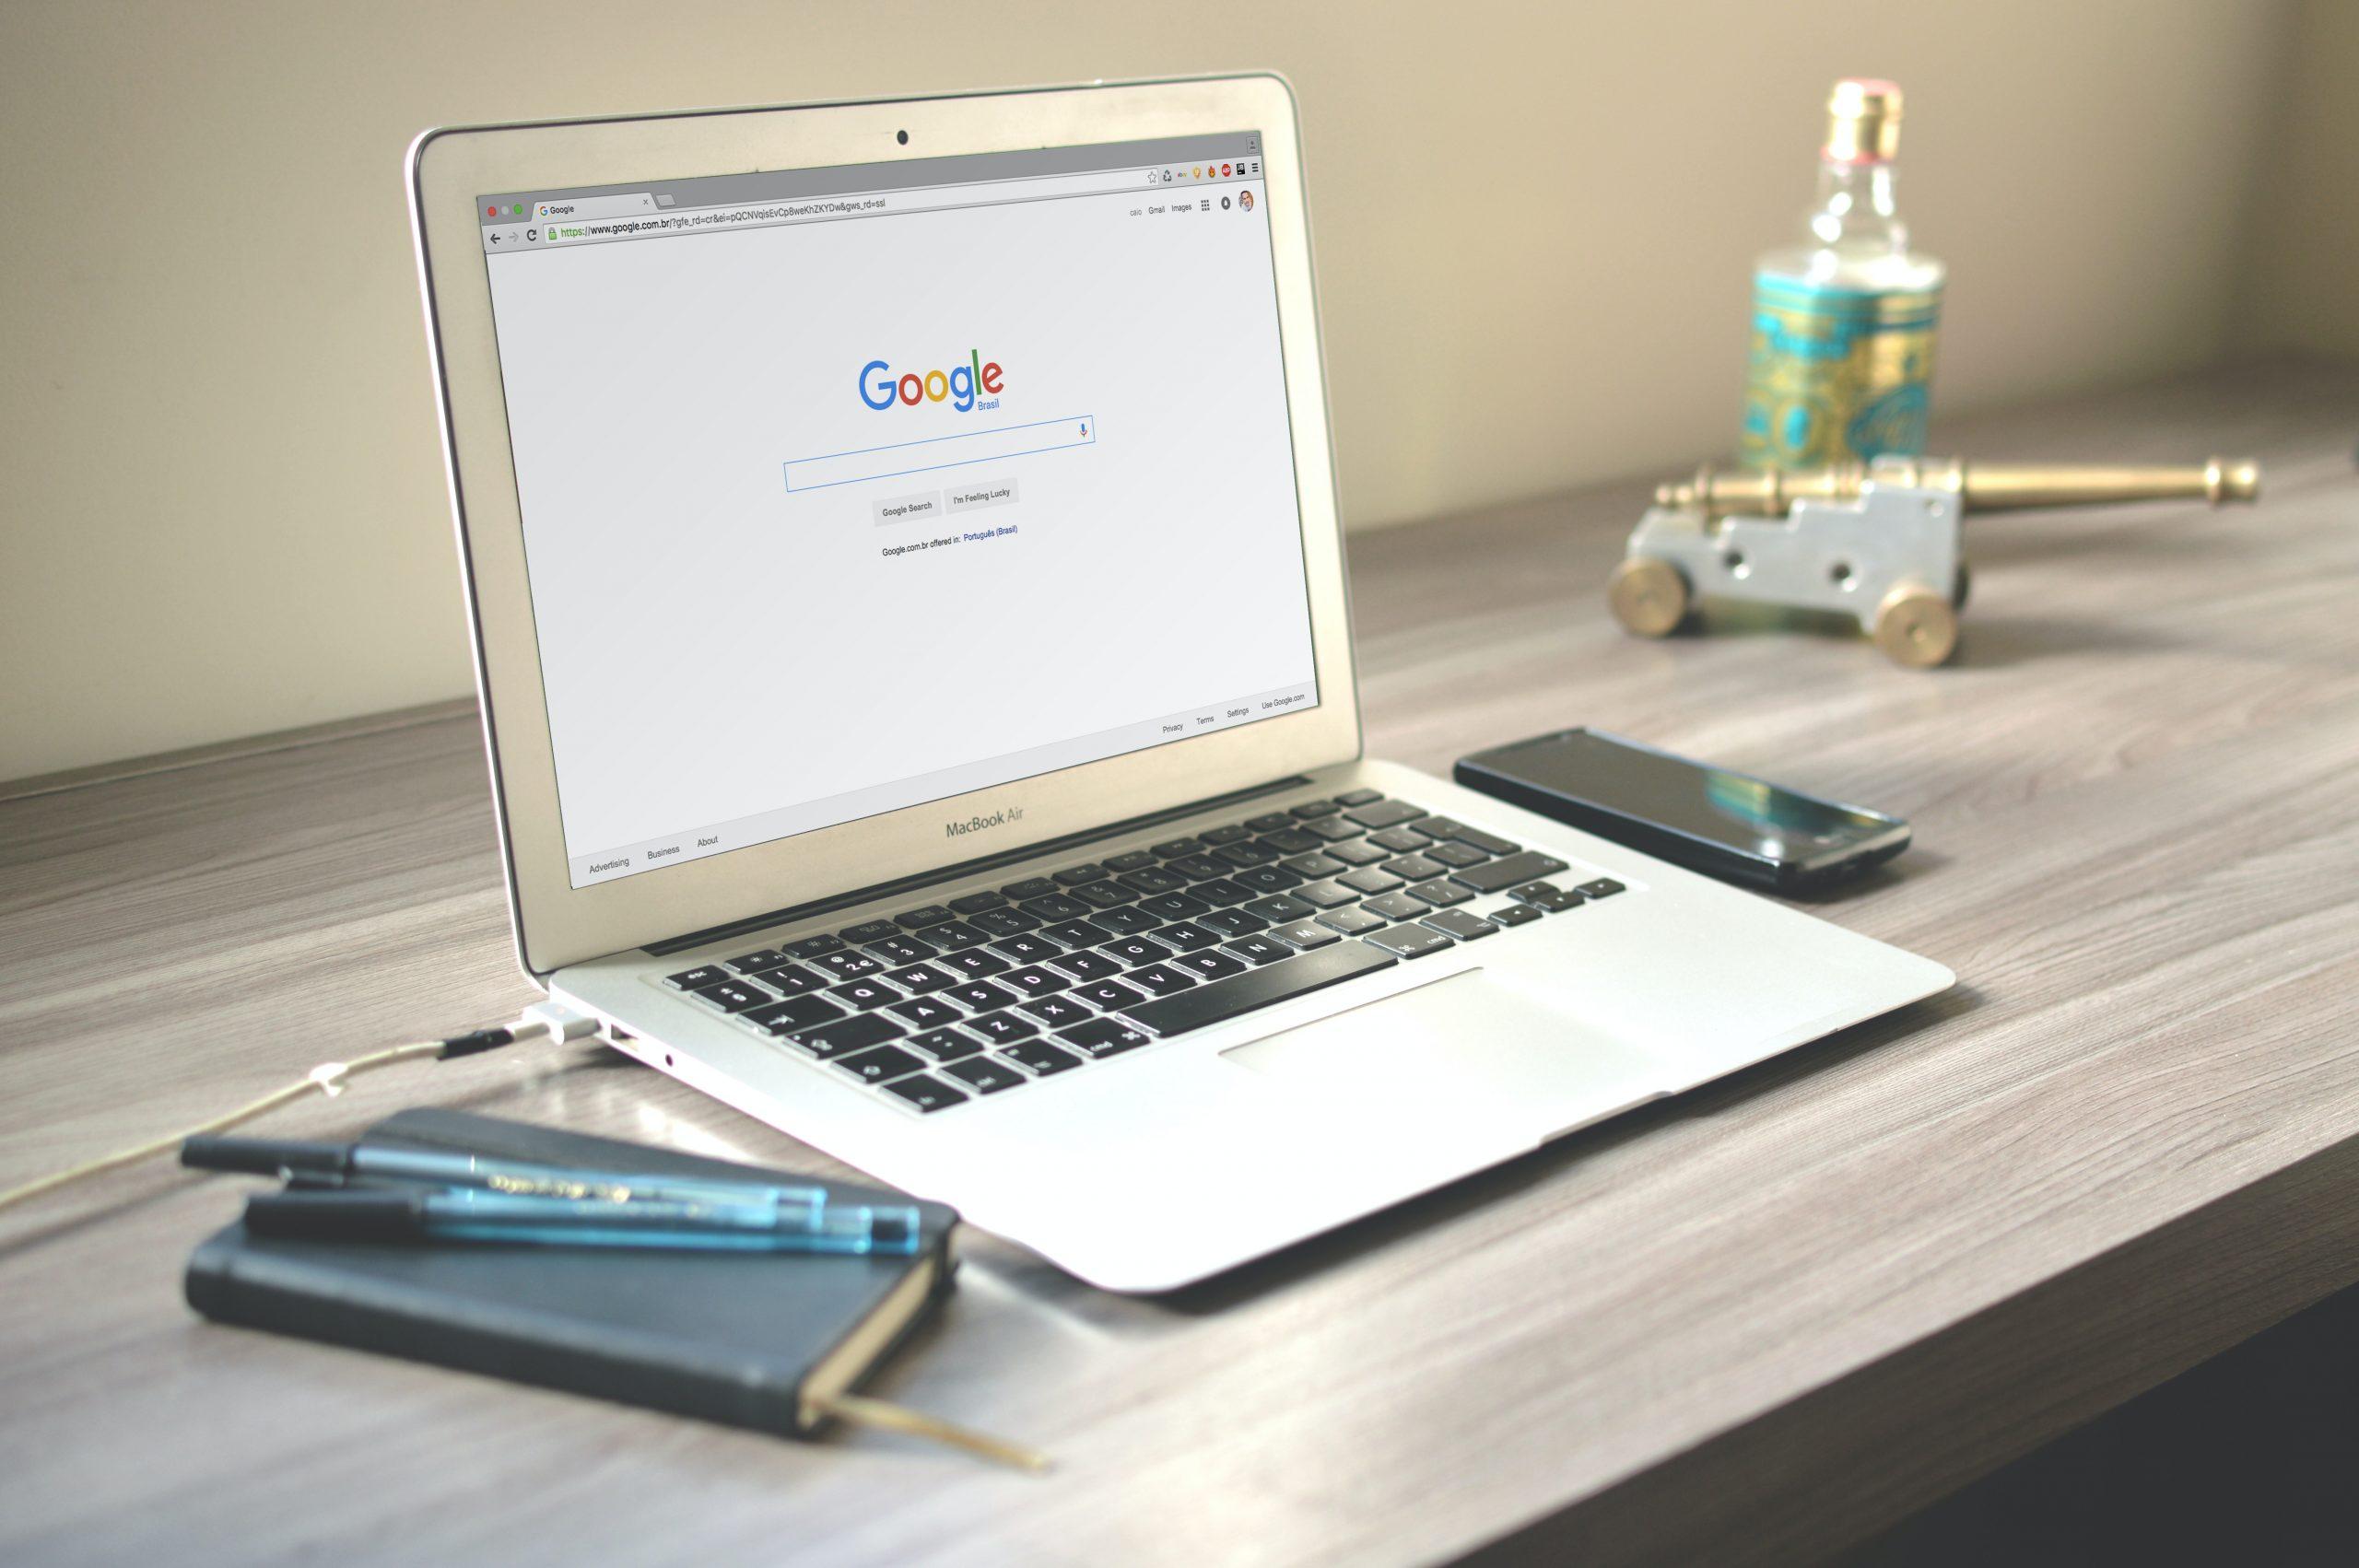 laptop with google logo